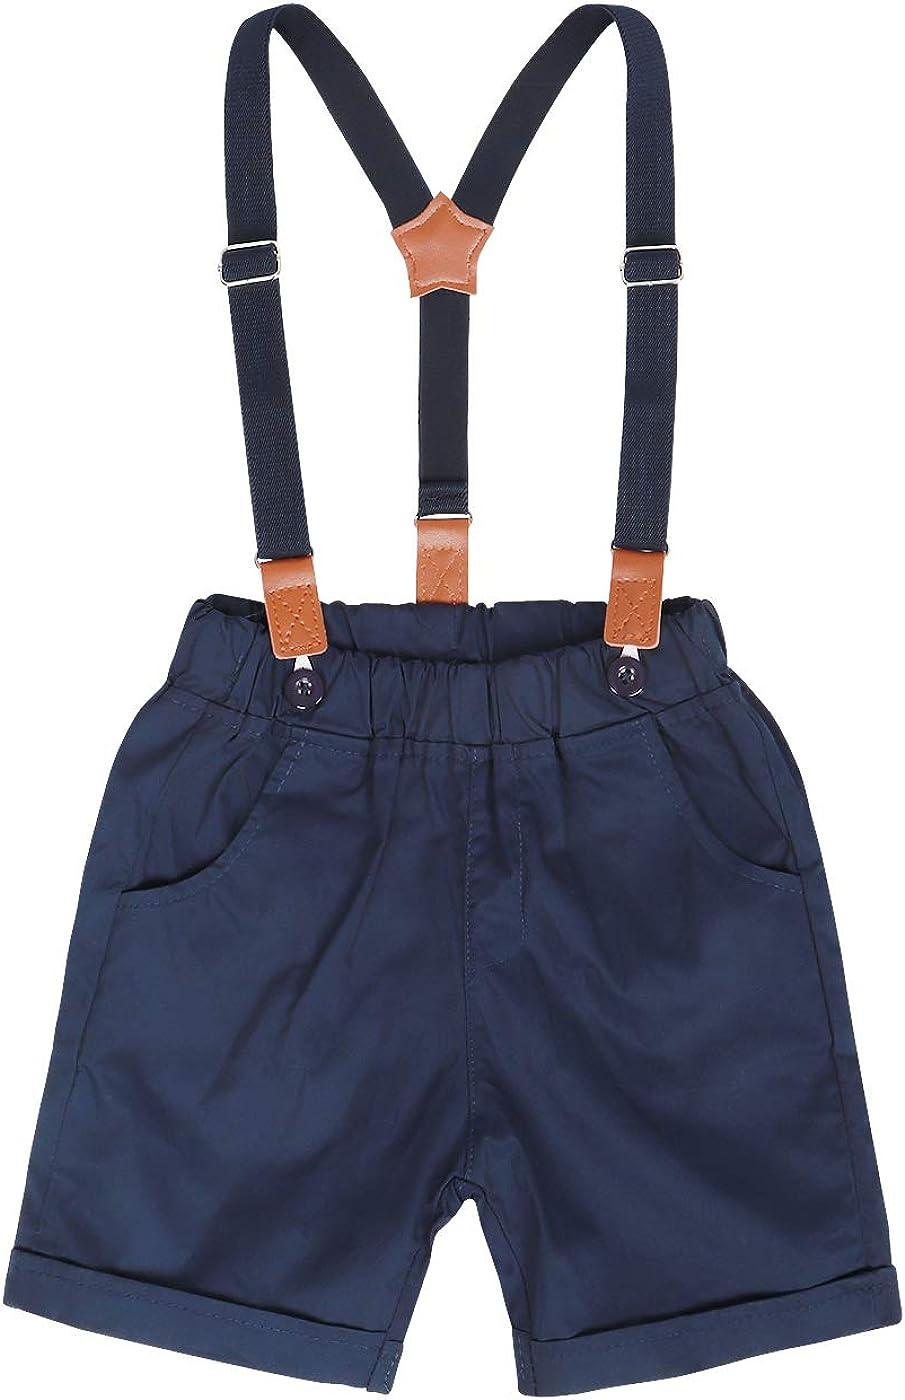 Kantenia Baby Boys Tuxedo Rompers Suit Short Sleeve Top Bowtie Romper Suspender Short Pant Wedding Birthday Set